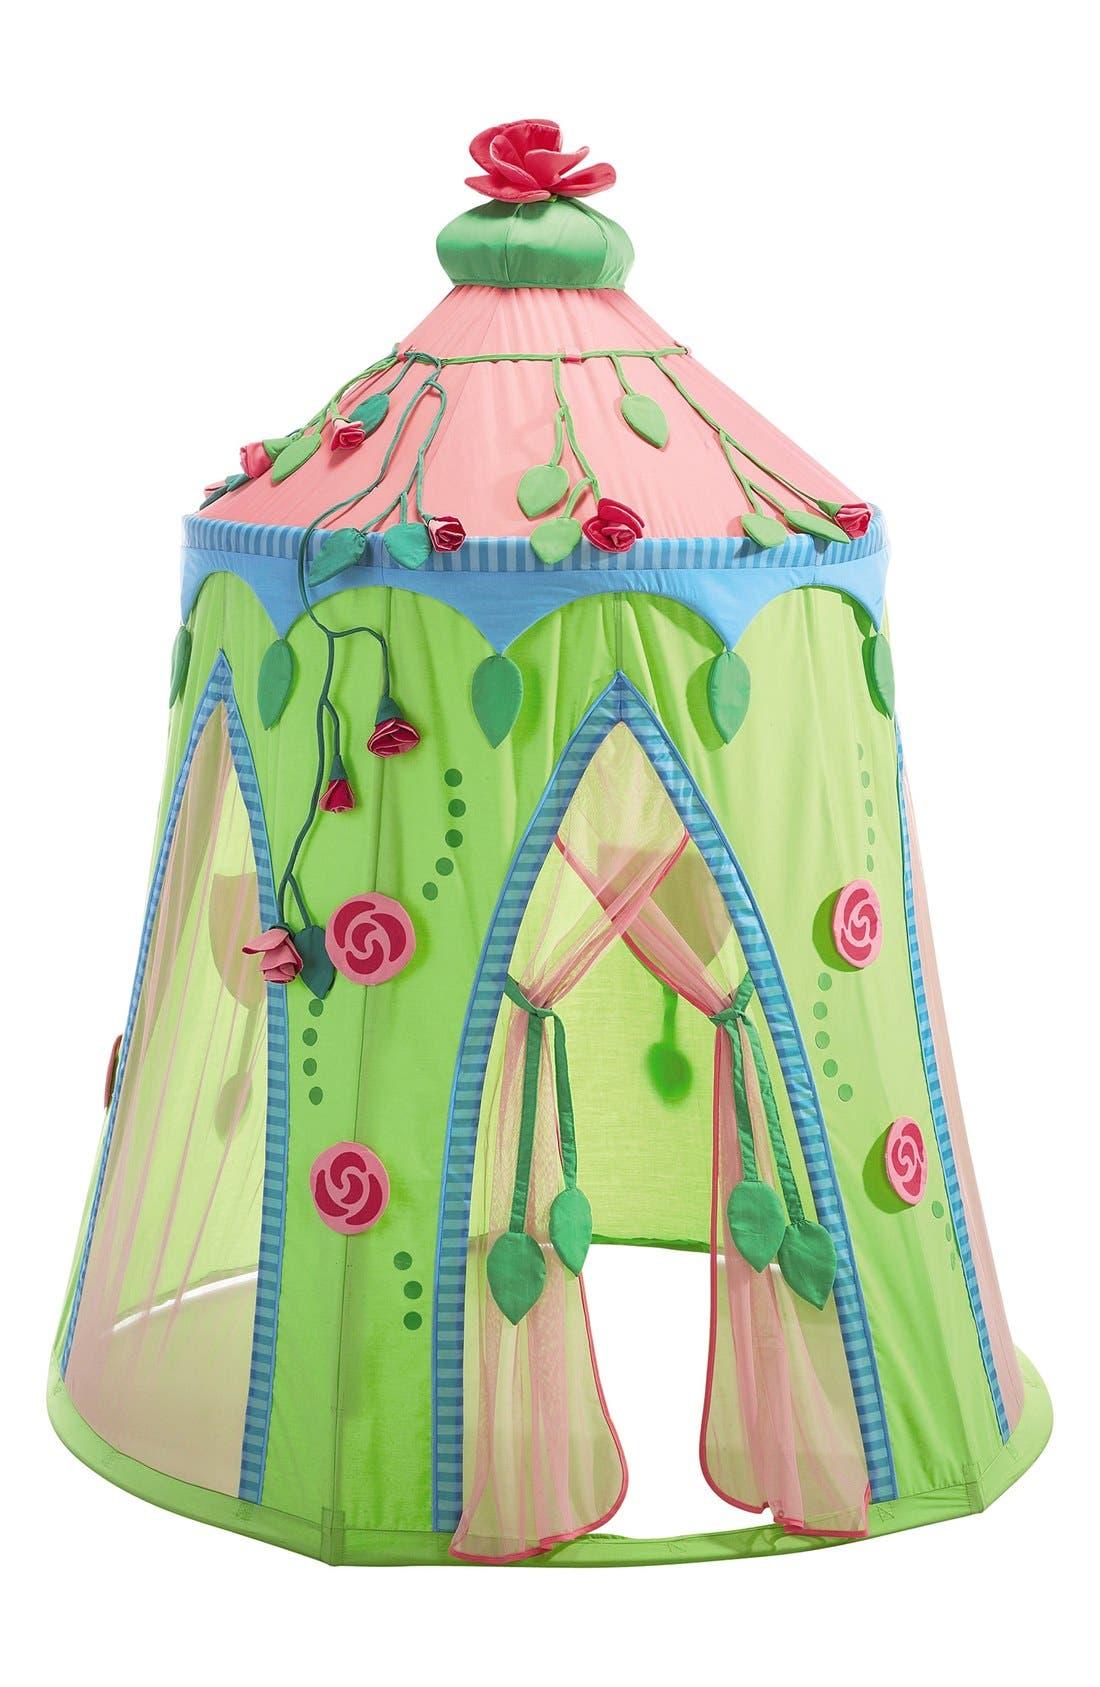 Main Image - HABA 'Rose Fairy' Play Tent